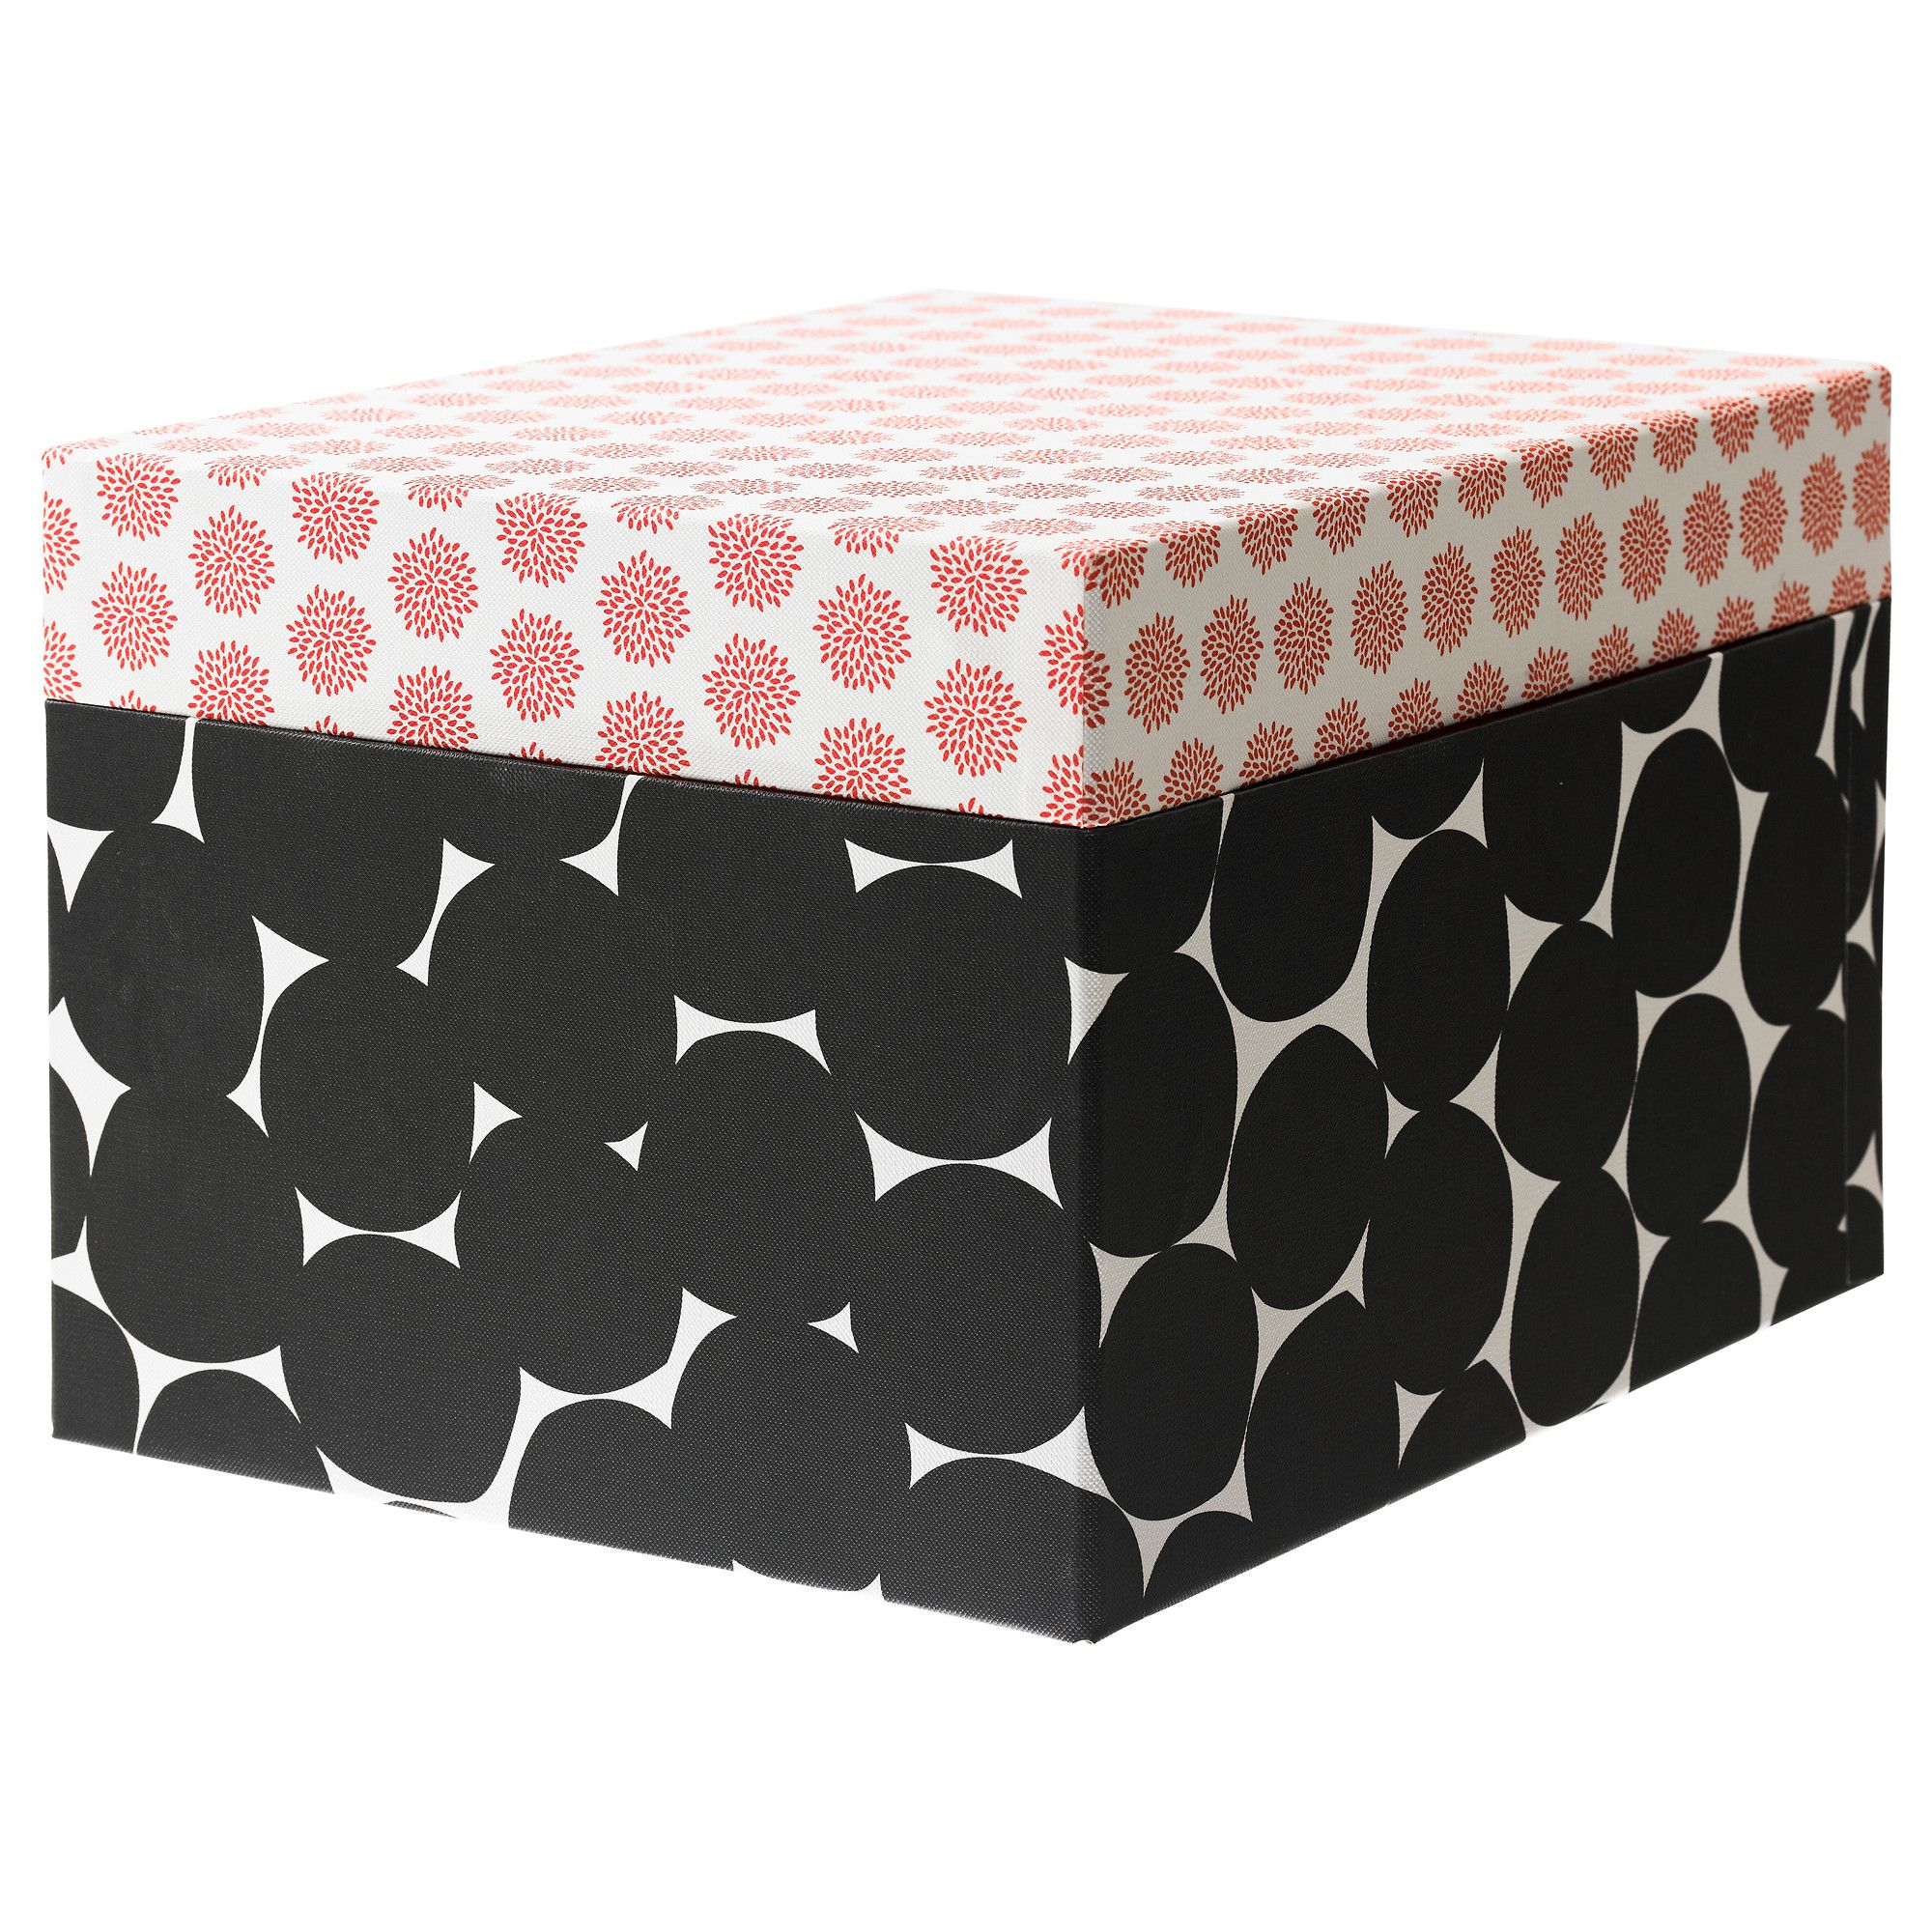 ikea office storage boxes. Office Storage // KVITTRA Box With Lid - Black, 12 ¾ Ikea Boxes